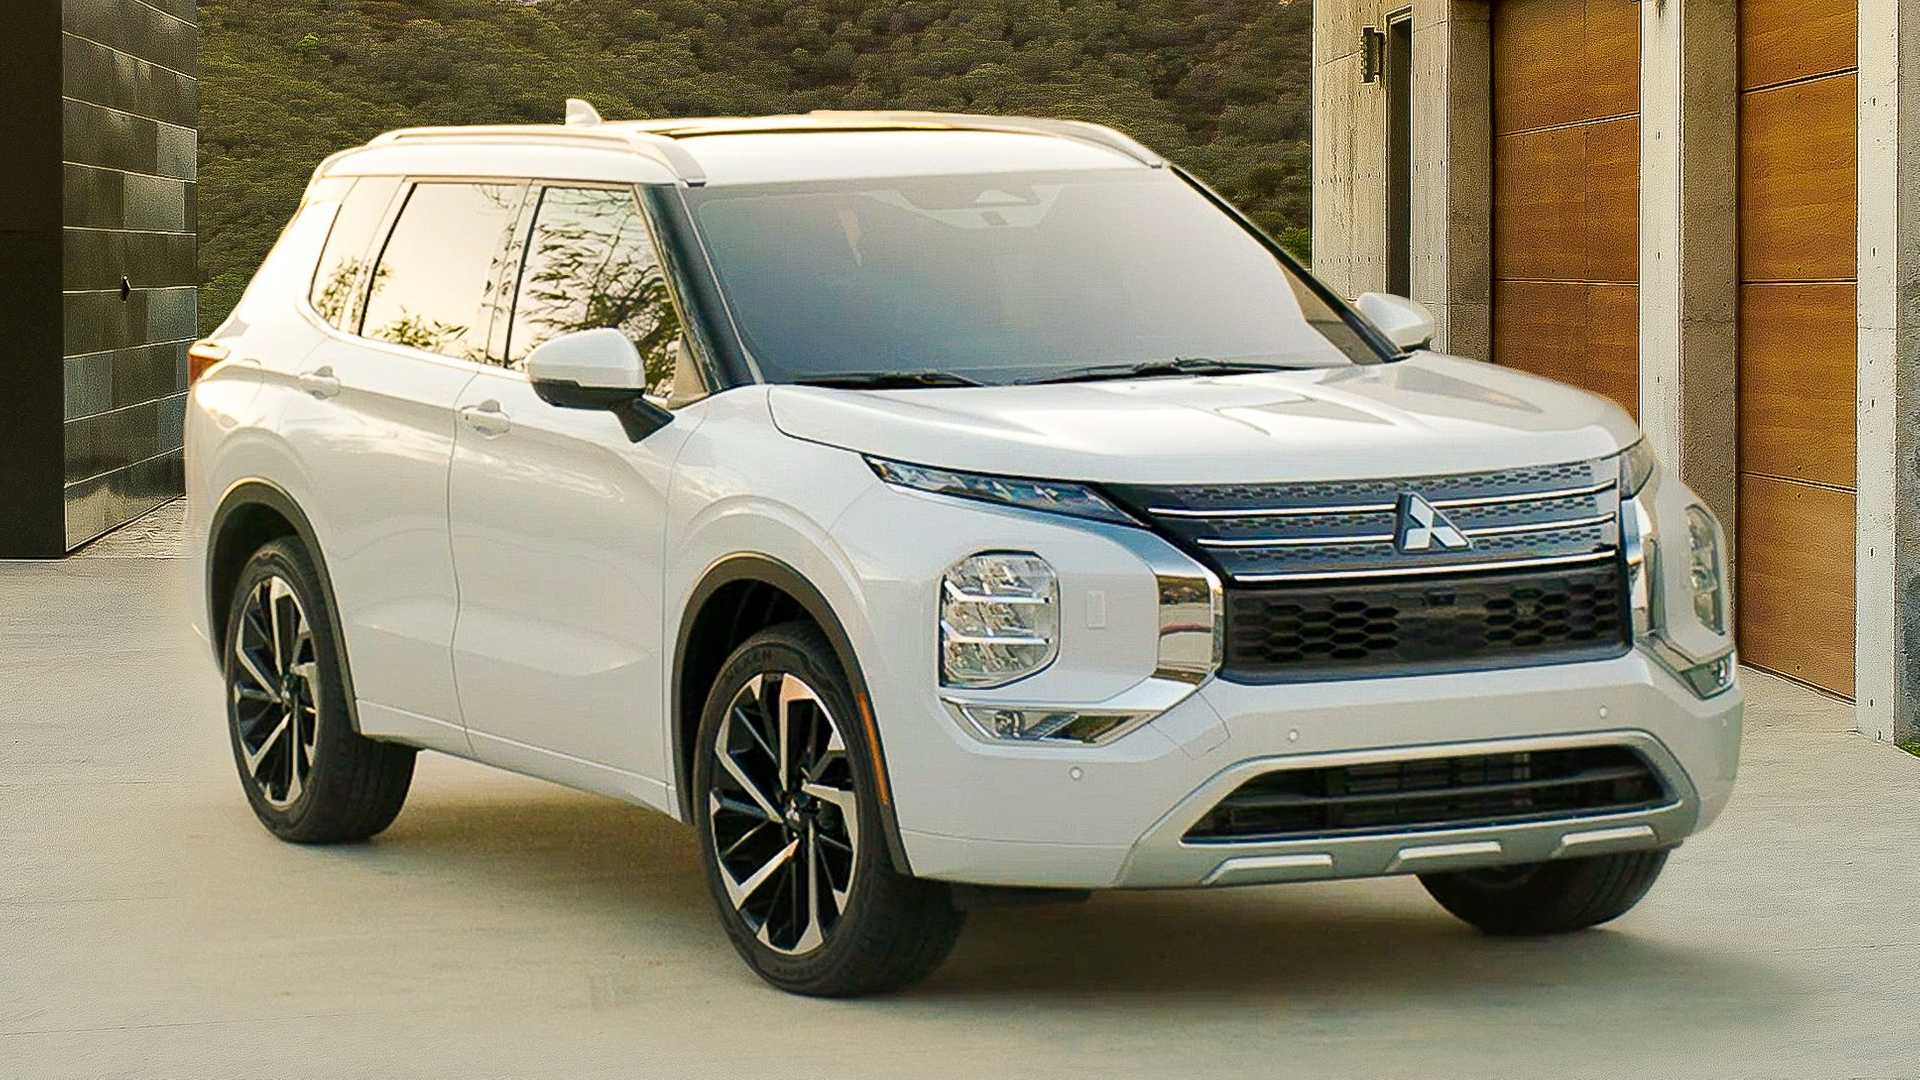 2022 Mitsubishi Outlander First Look